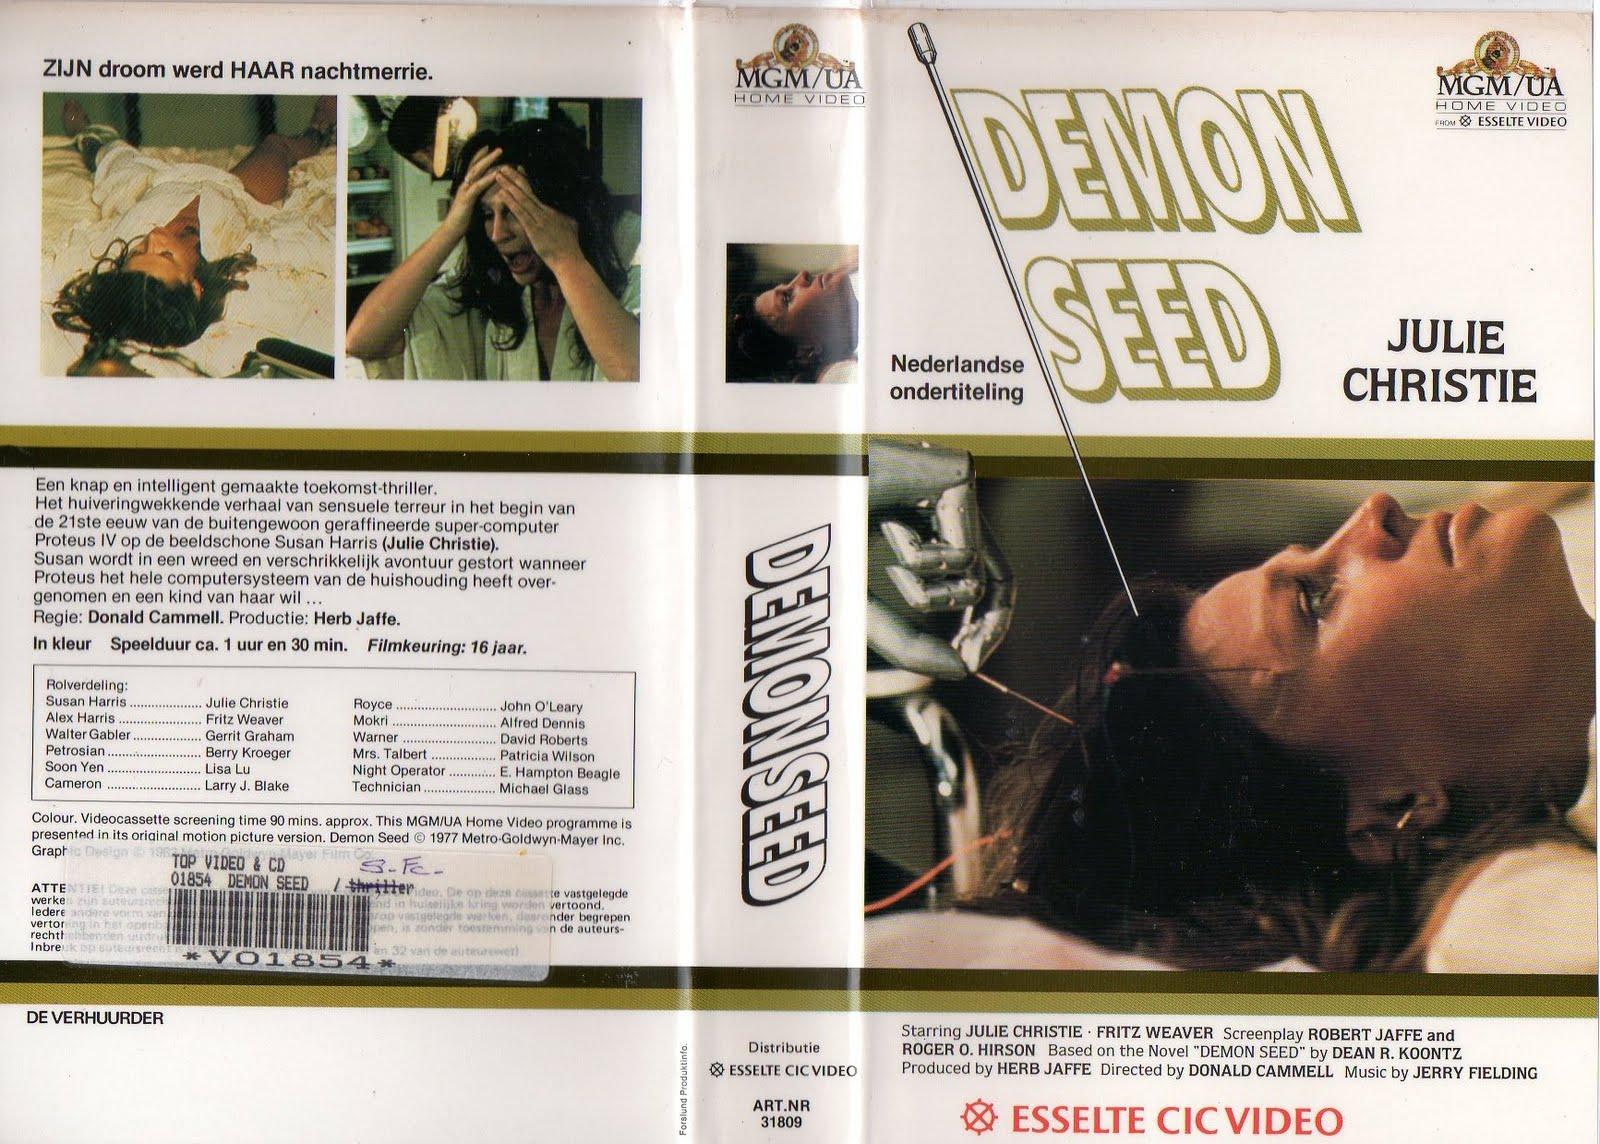 Cult VHS: Demon Seed